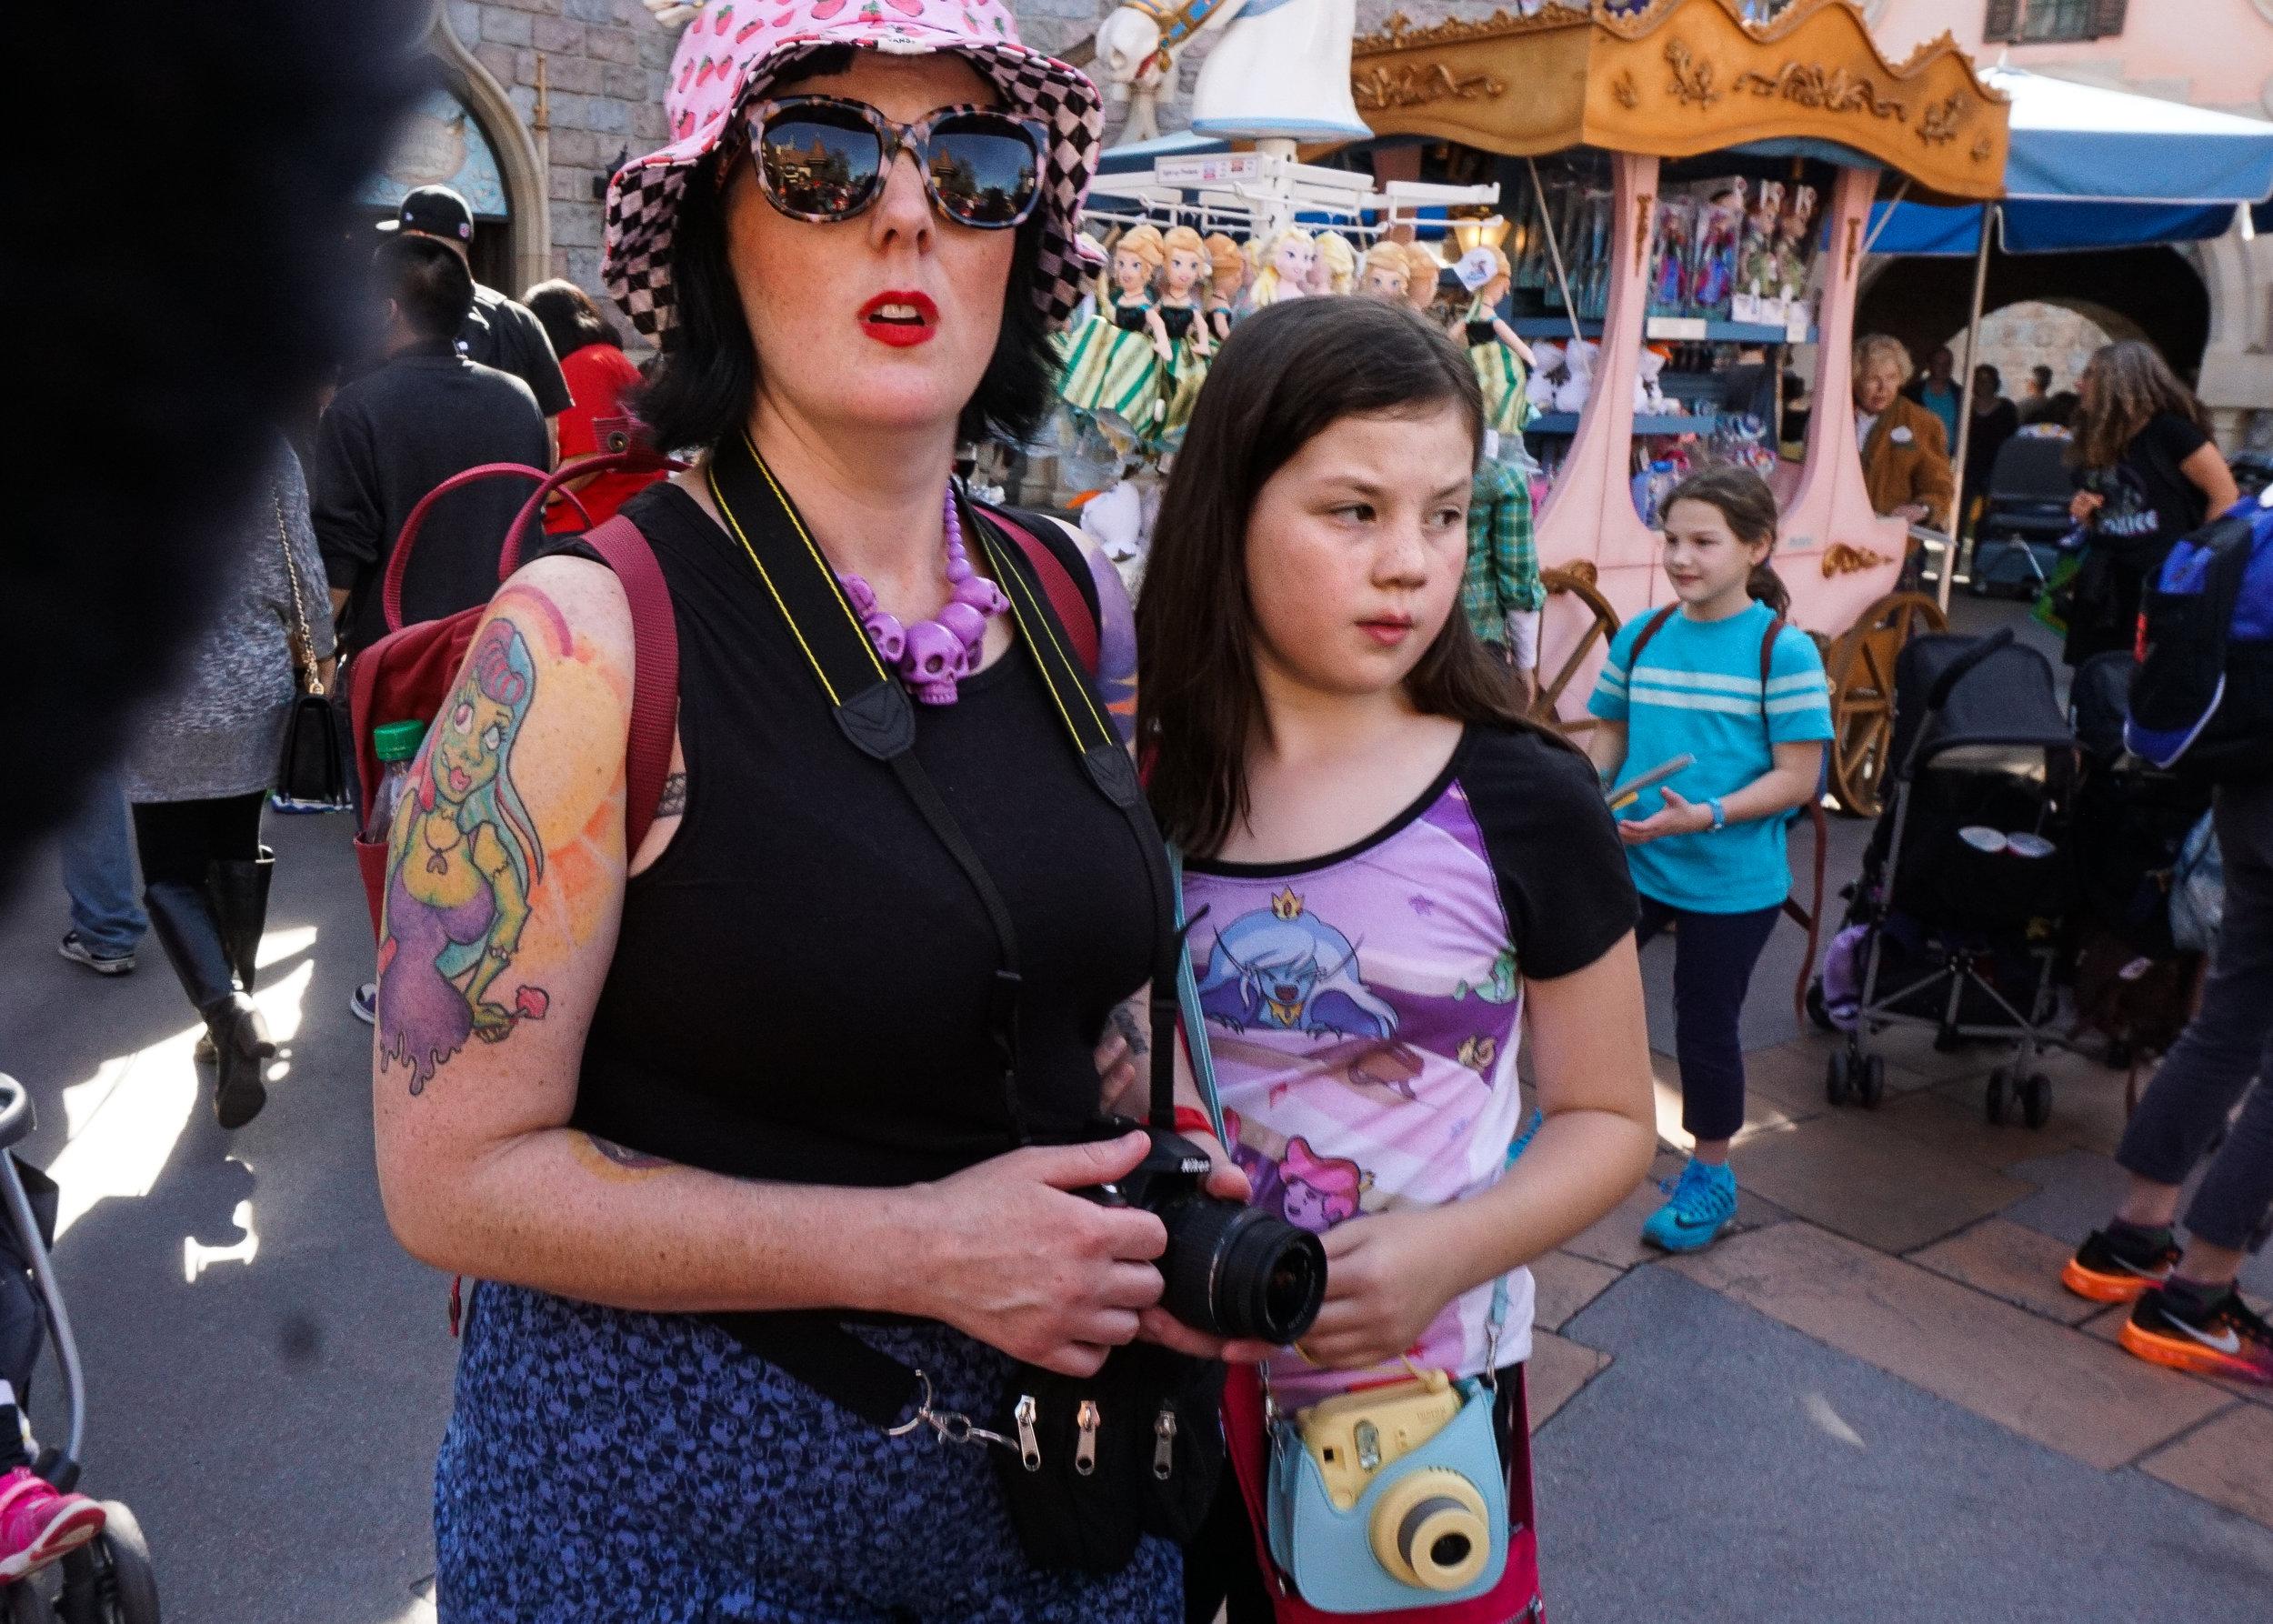 Disney-Mother-dtr-6-03549.jpg